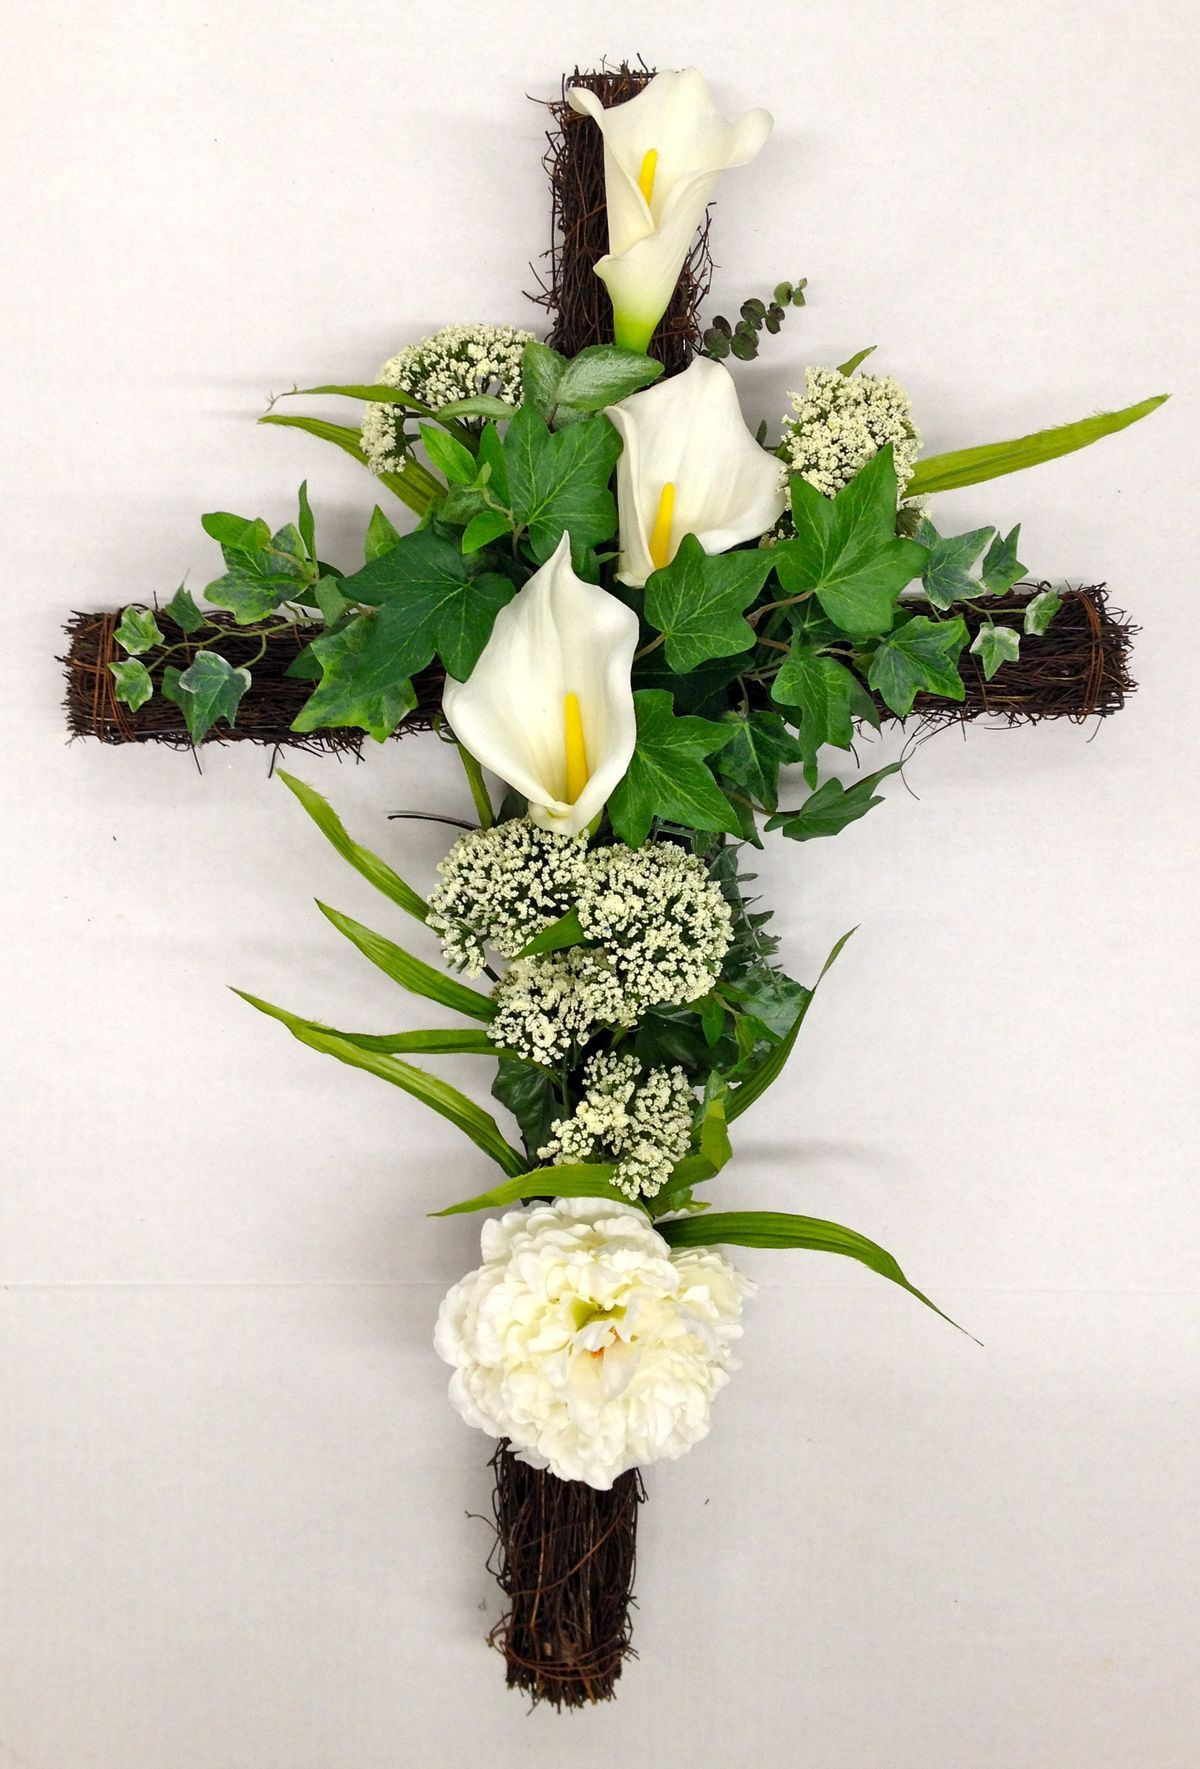 B13c43e79124bb651e55e1484154432dg 12001769 pixels diy cemetery flowers izmirmasajfo